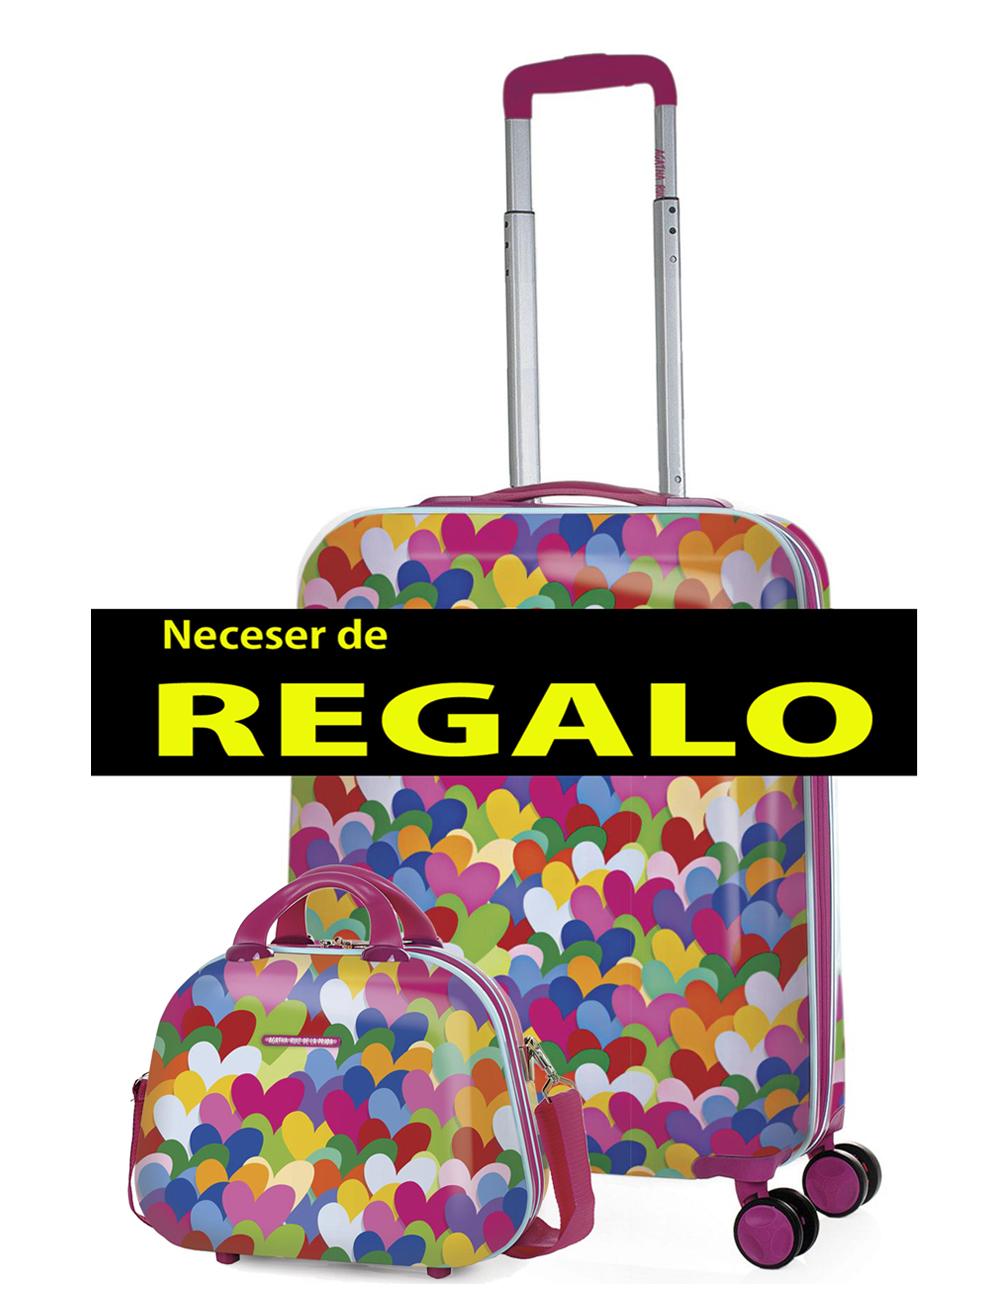 131150 2 Maleta Cabina 55cm Agatha Ruiz de la Prada Corazones Colores